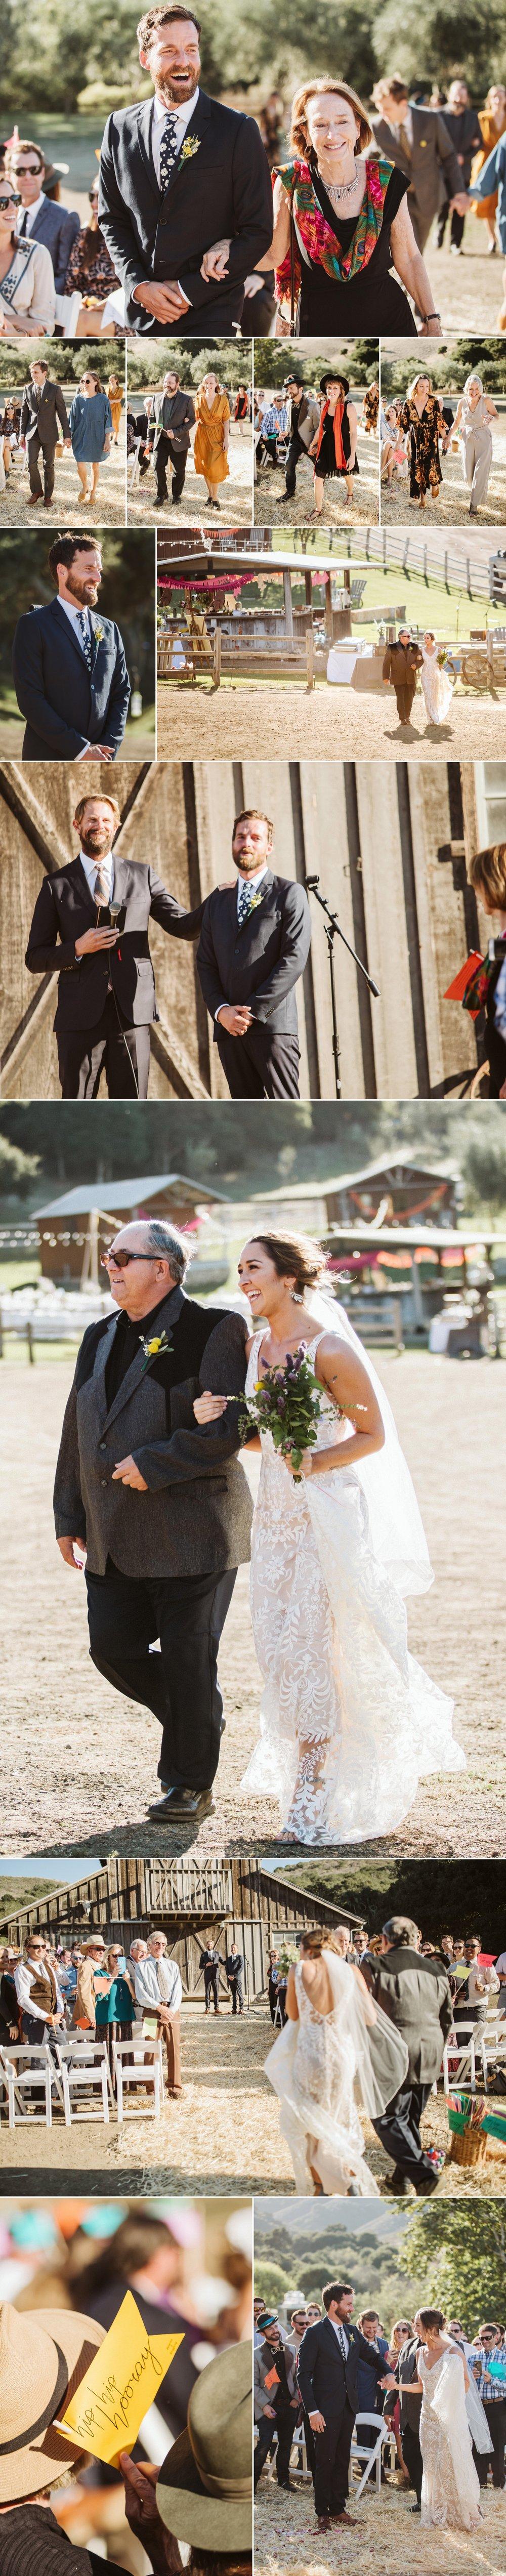 Colorful Barn Wedding at Jalama Canon Ranch- Lompoc- Santa Barbara- Geoff & Lauren 16.jpg